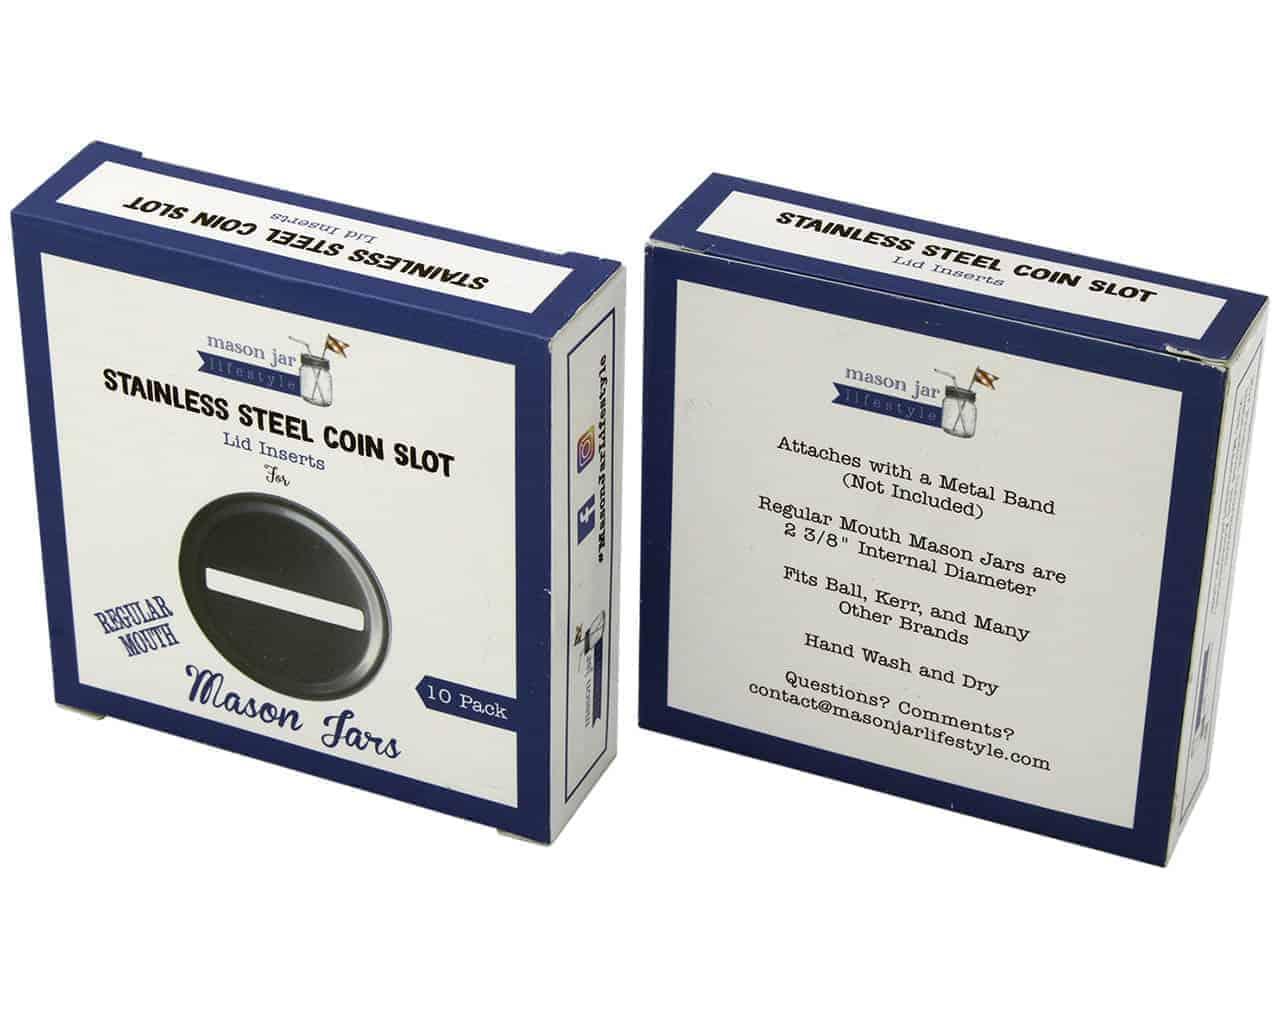 mason-jar-lifestyle-stainless-steel-coin-slot-bank-lid-insert-regular-mouth-mason-jars-package